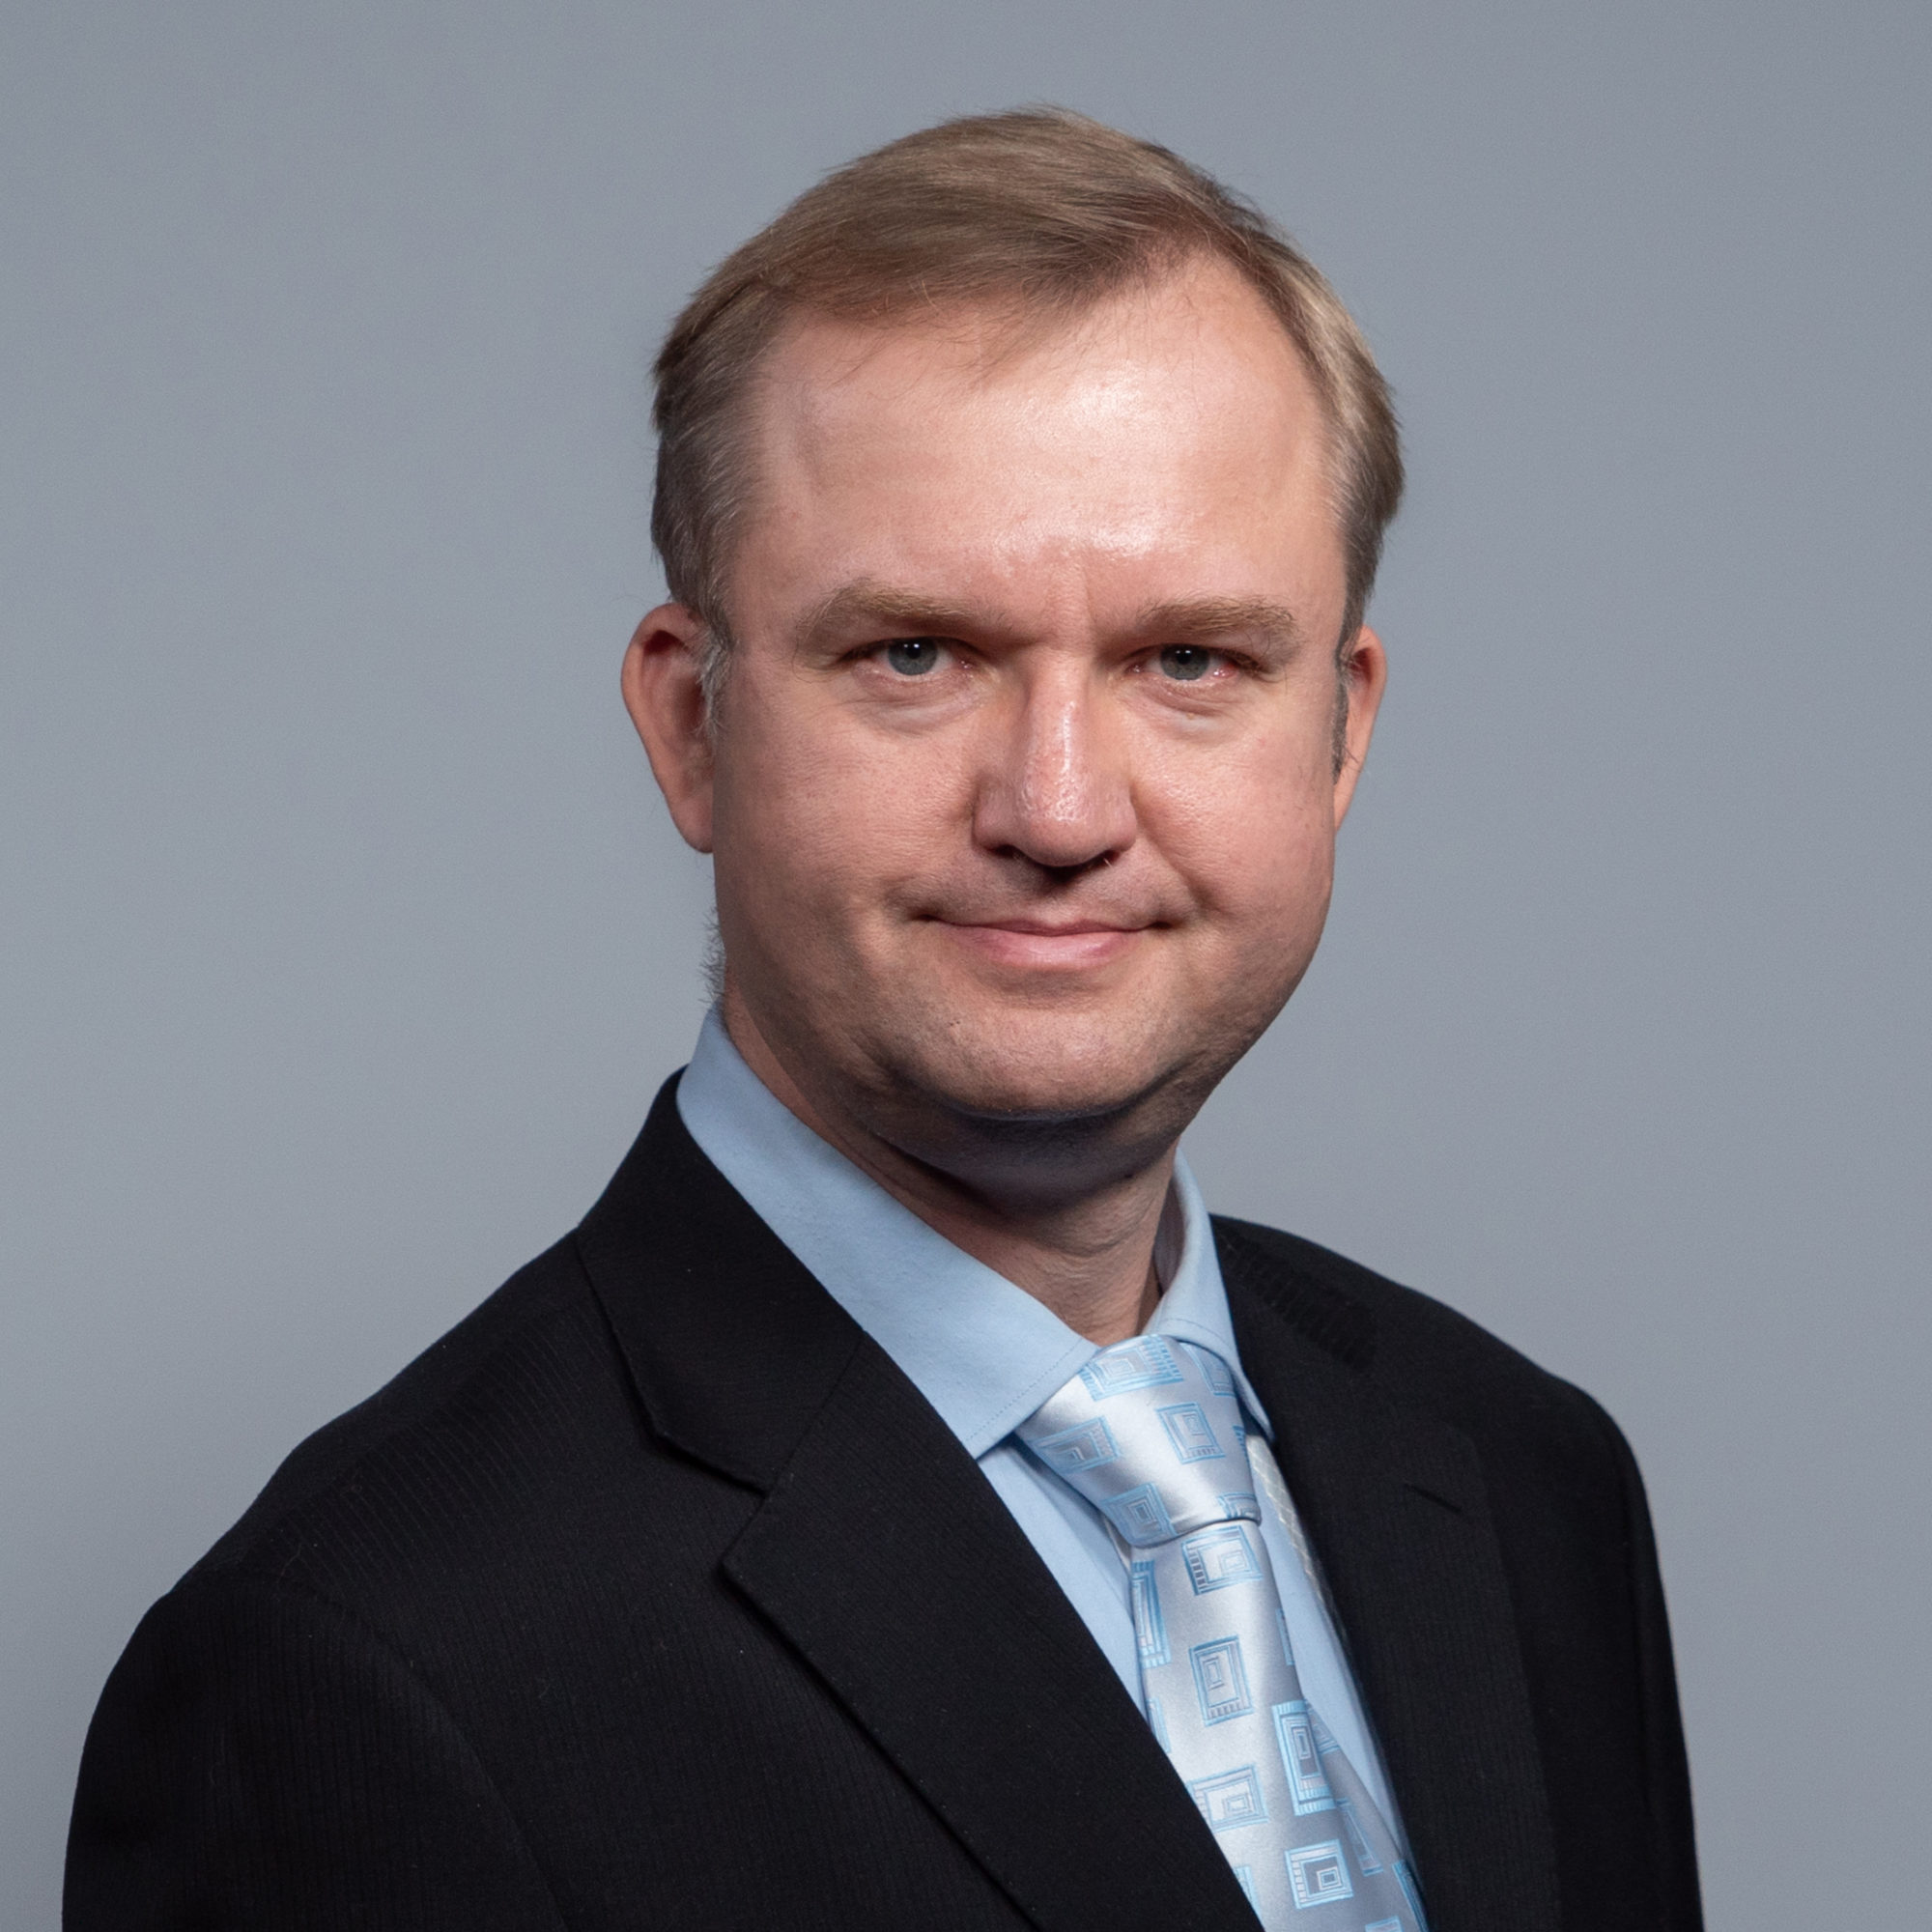 Sergei Likhachev